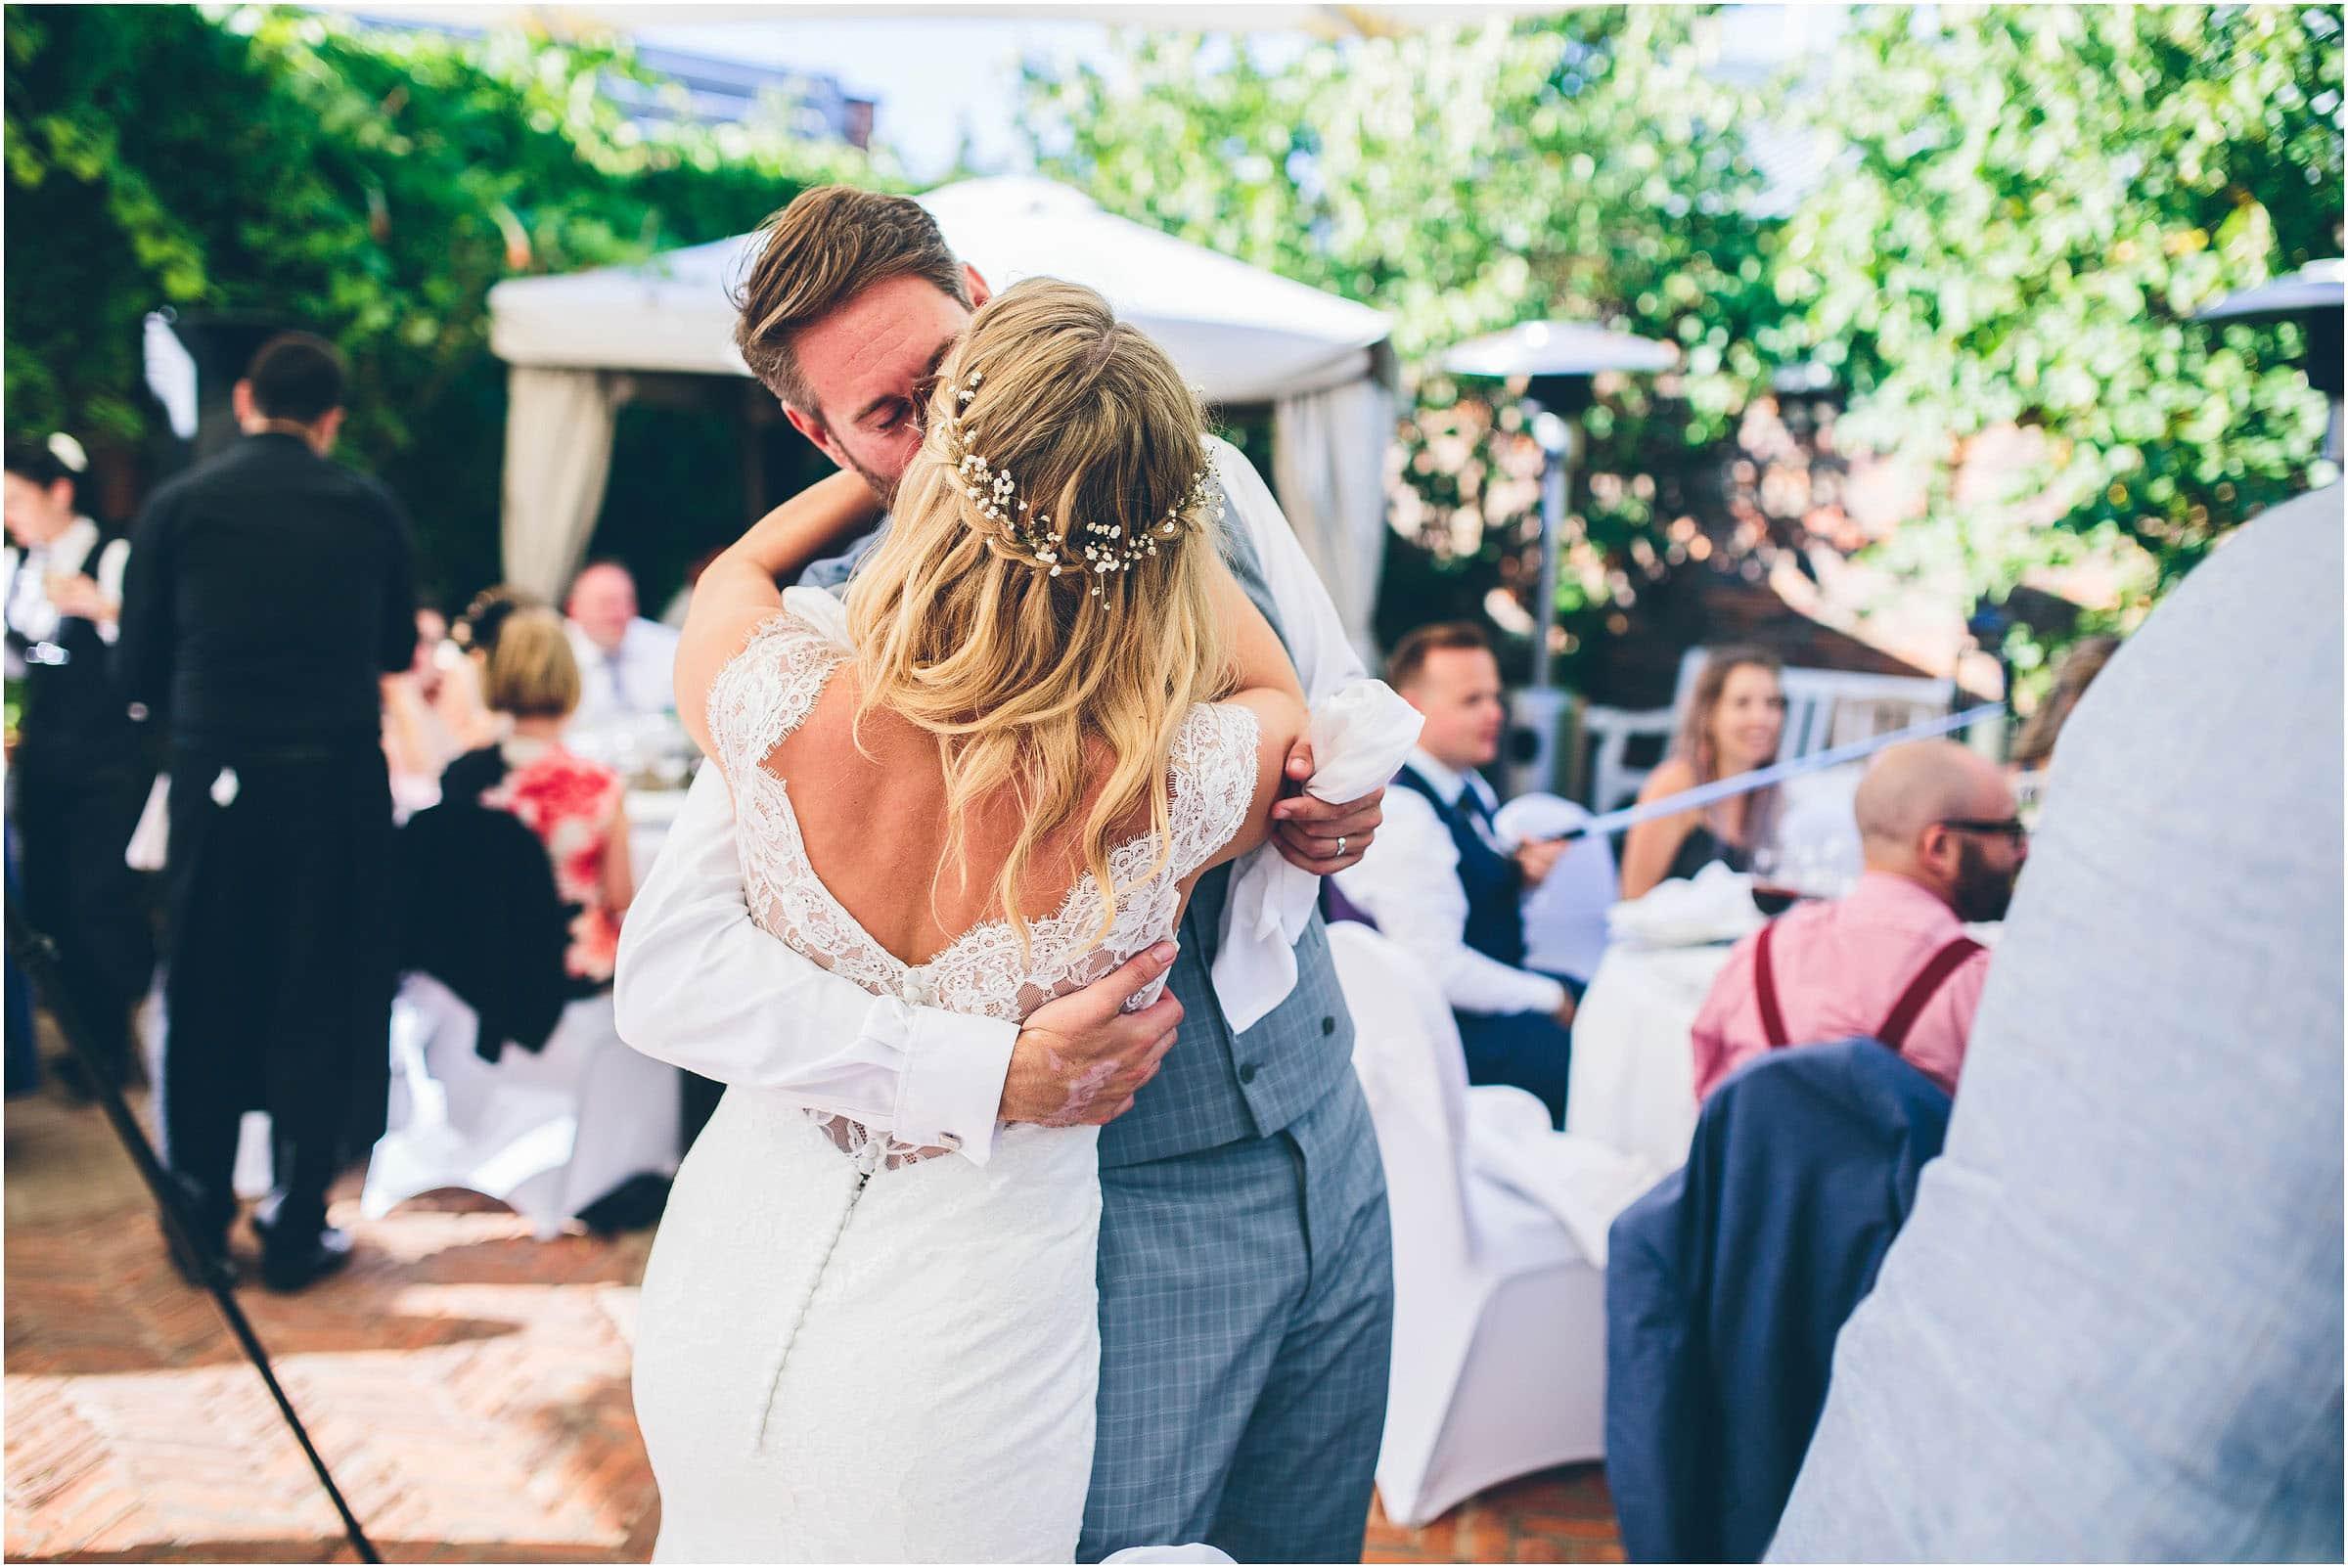 Kensington_Roof_Gardens_Wedding_Photography_0084